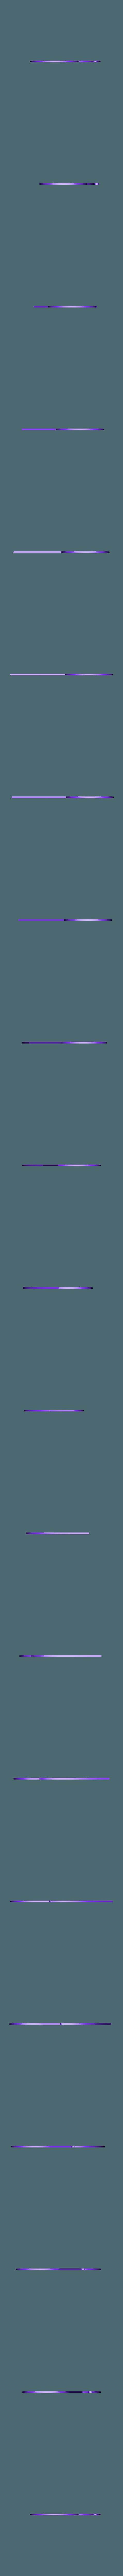 Uta_jazz_white.STL Download free STL file Minimal Multi-color NBA coasters • 3D print object, MosaicManufacturing